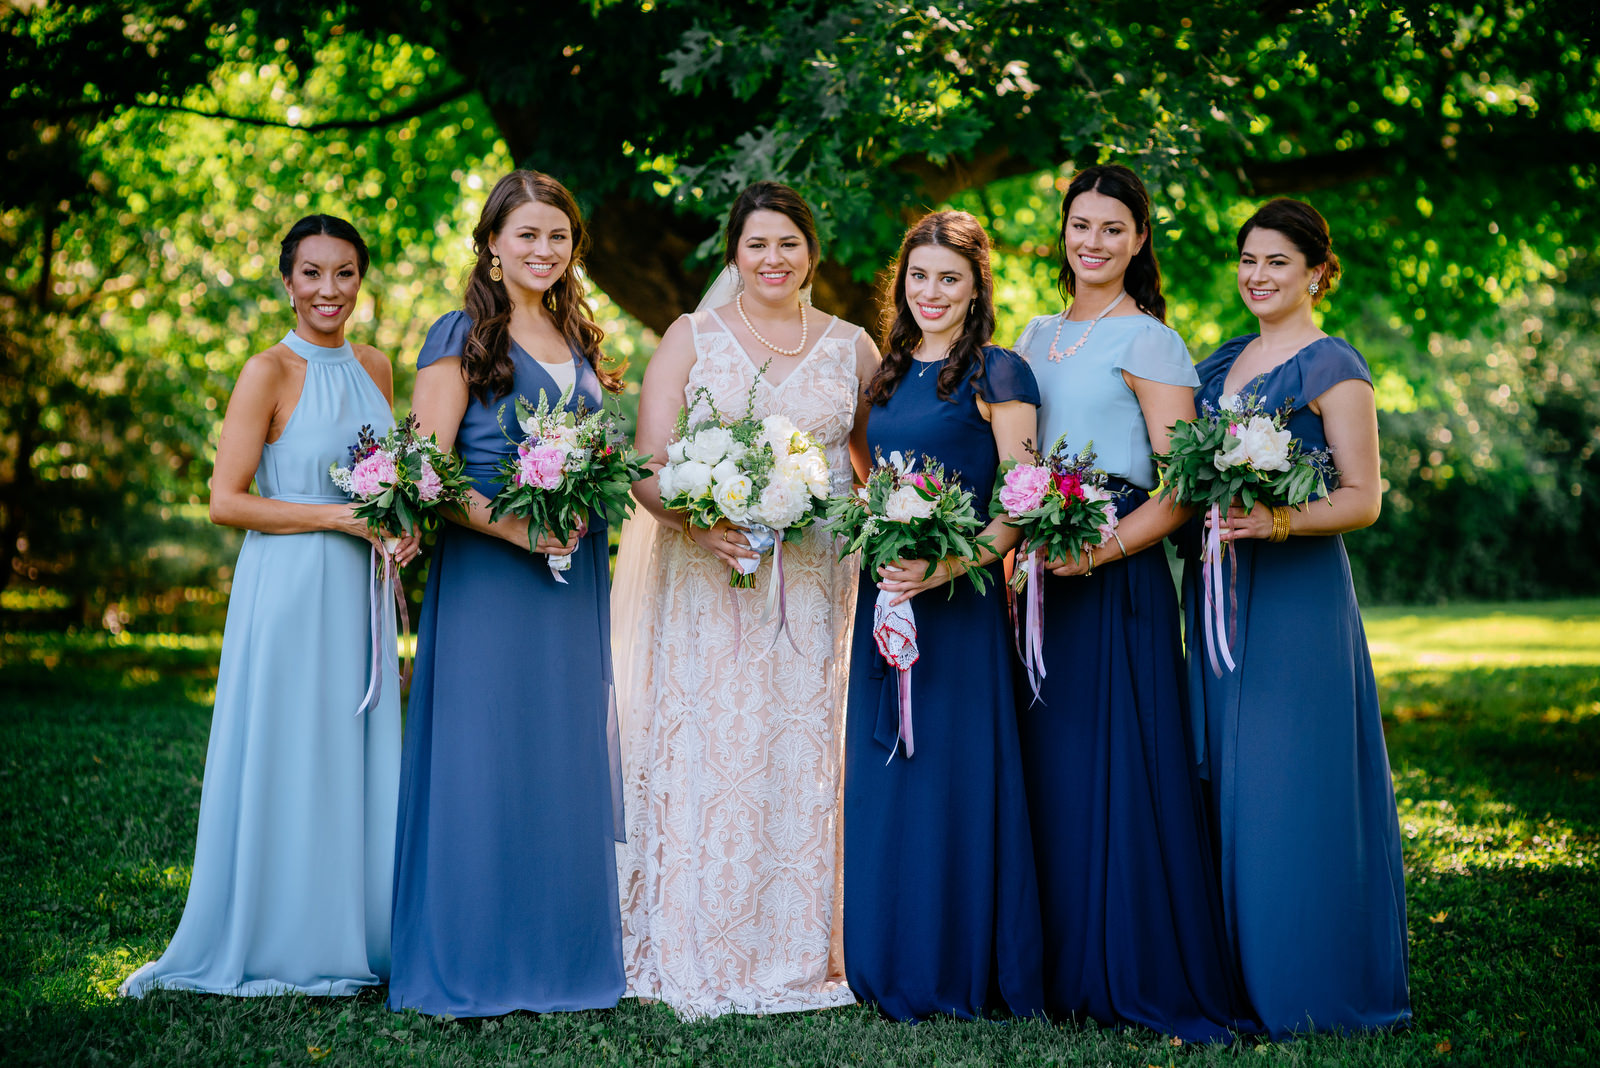 bridesmaids lexington ky wedding